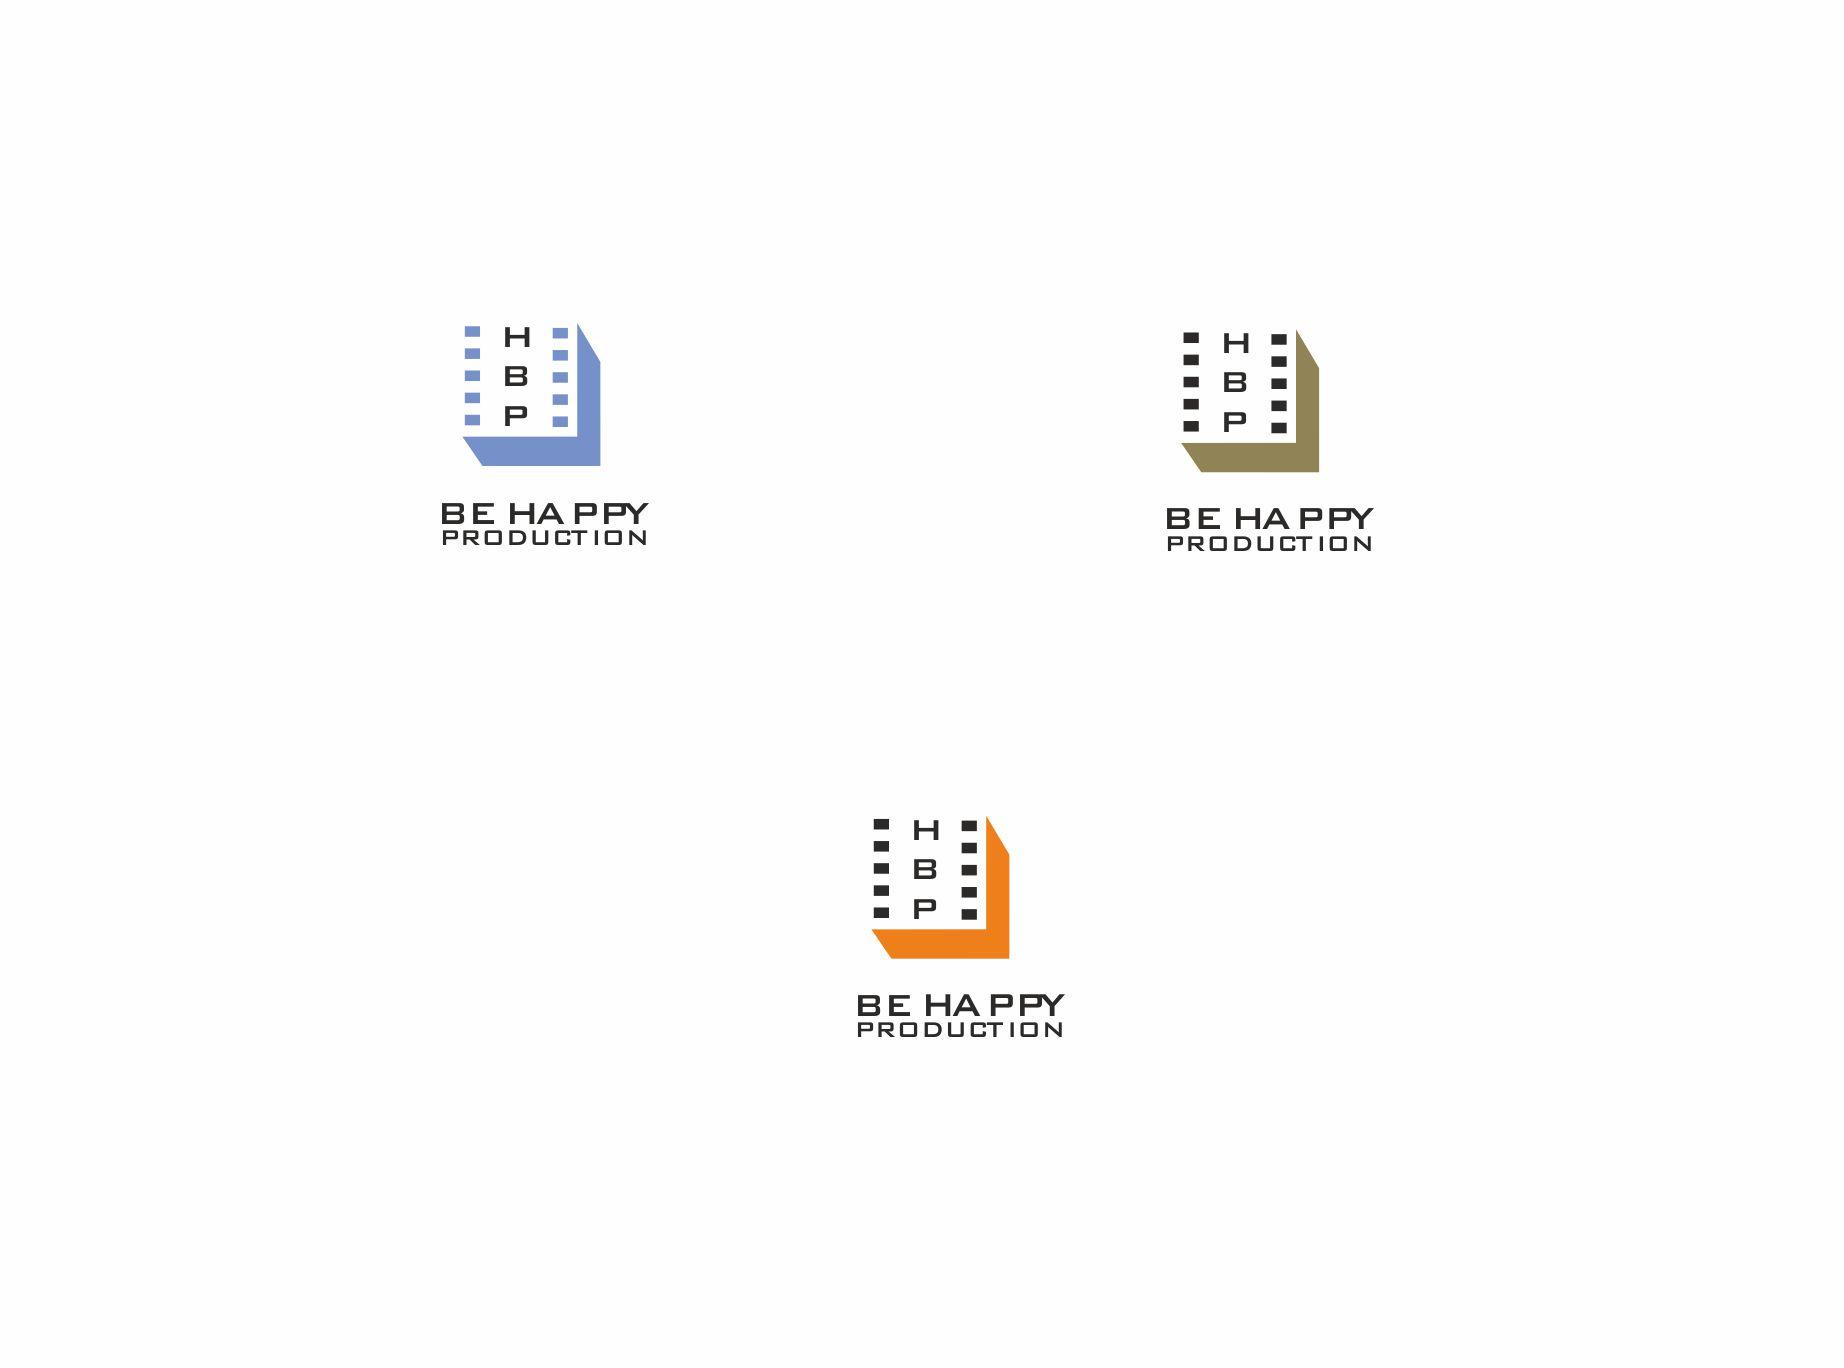 Логотип для Be Happy Production  - дизайнер sv58